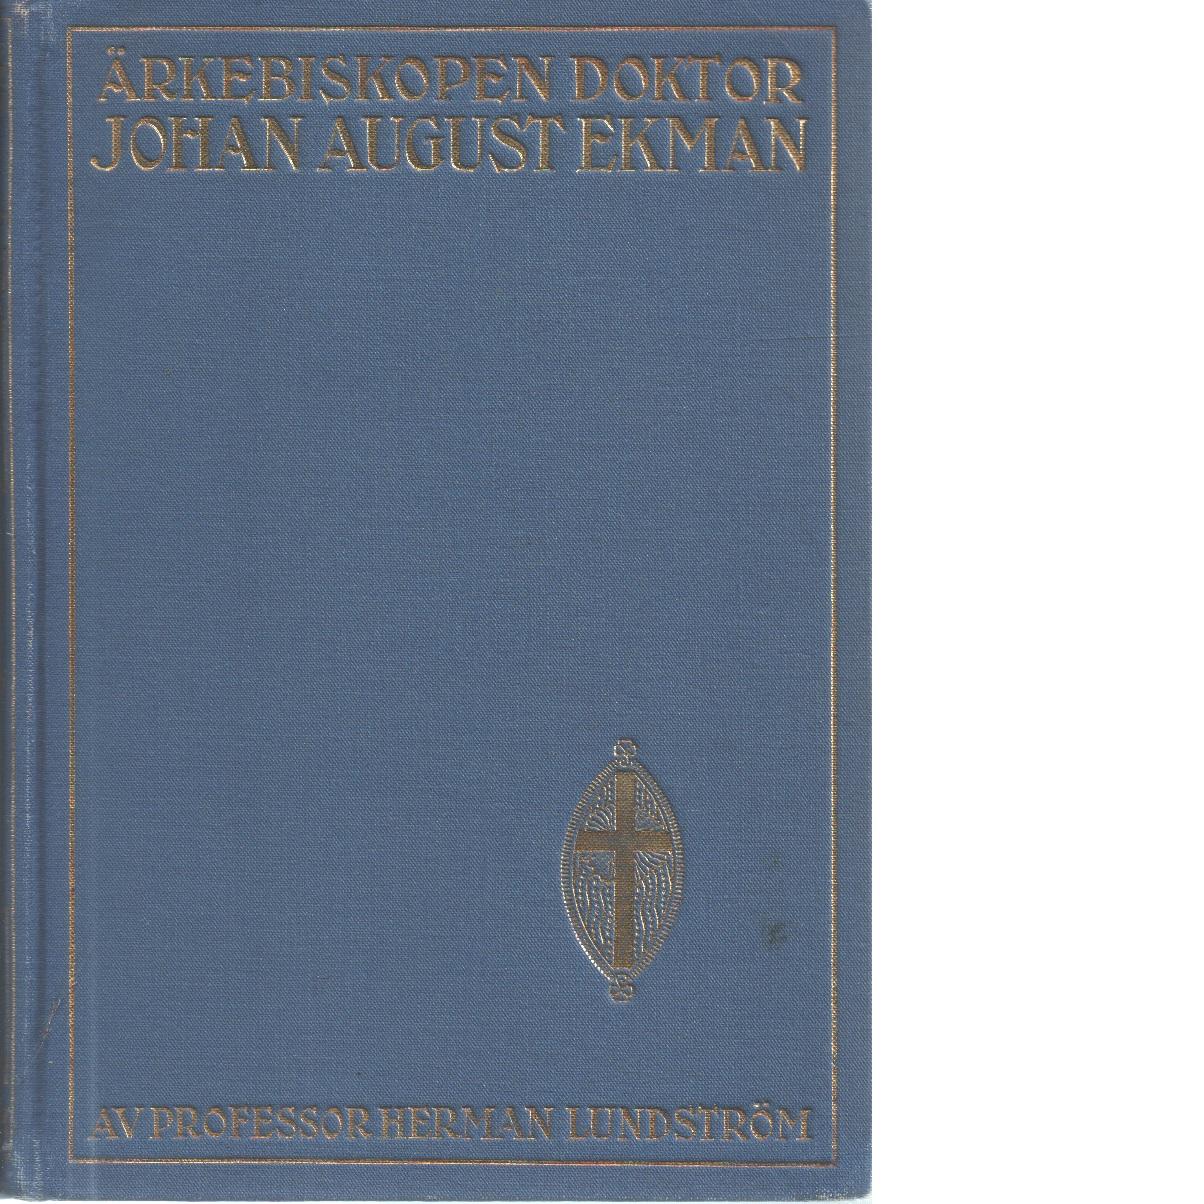 Ärkebiskopen, doktor Johan August Ekman : några minnesblad - Lundström, Herman